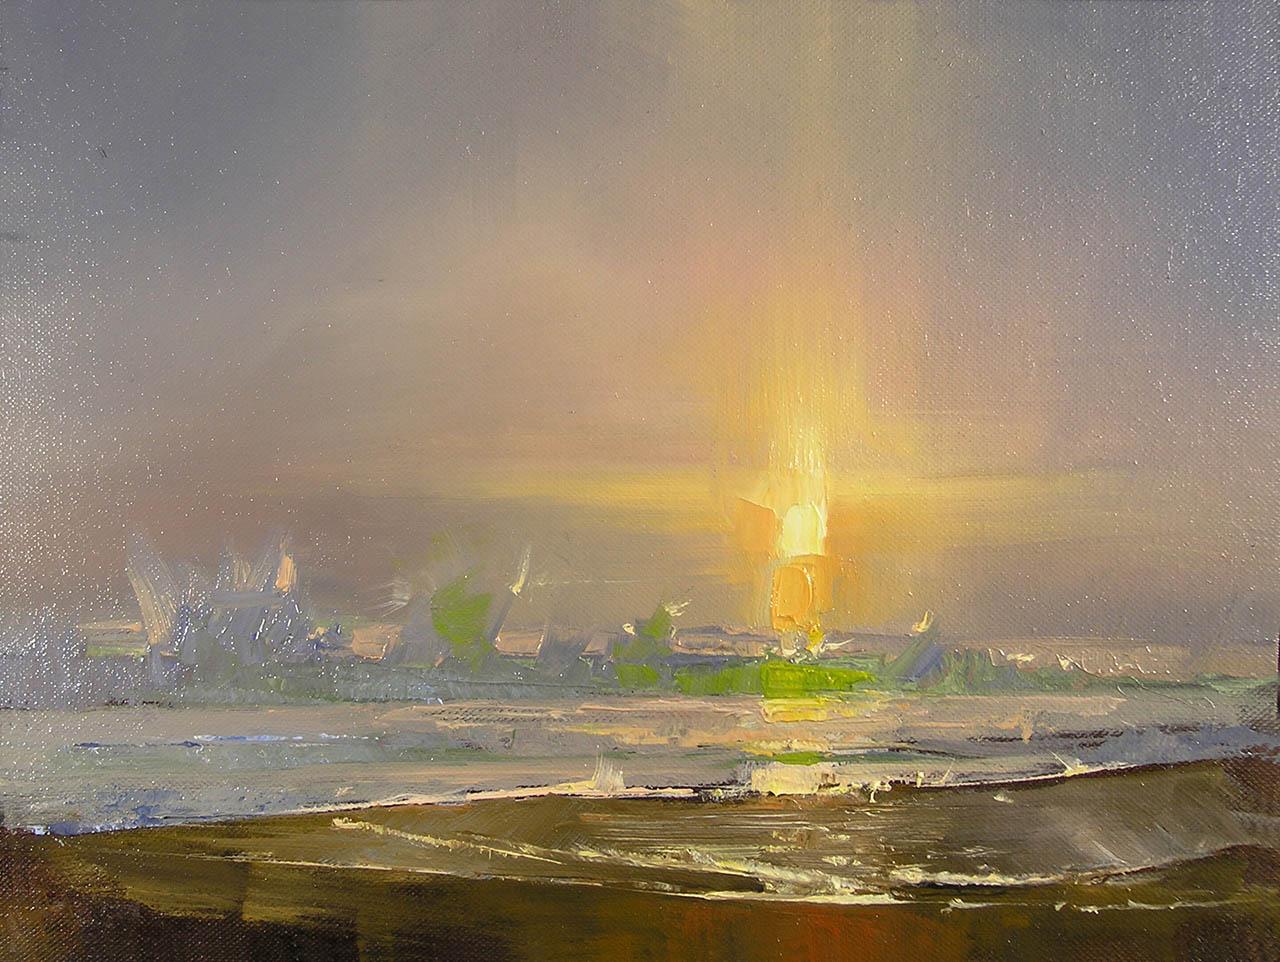 Baja Sunset, by Carol Tarzier